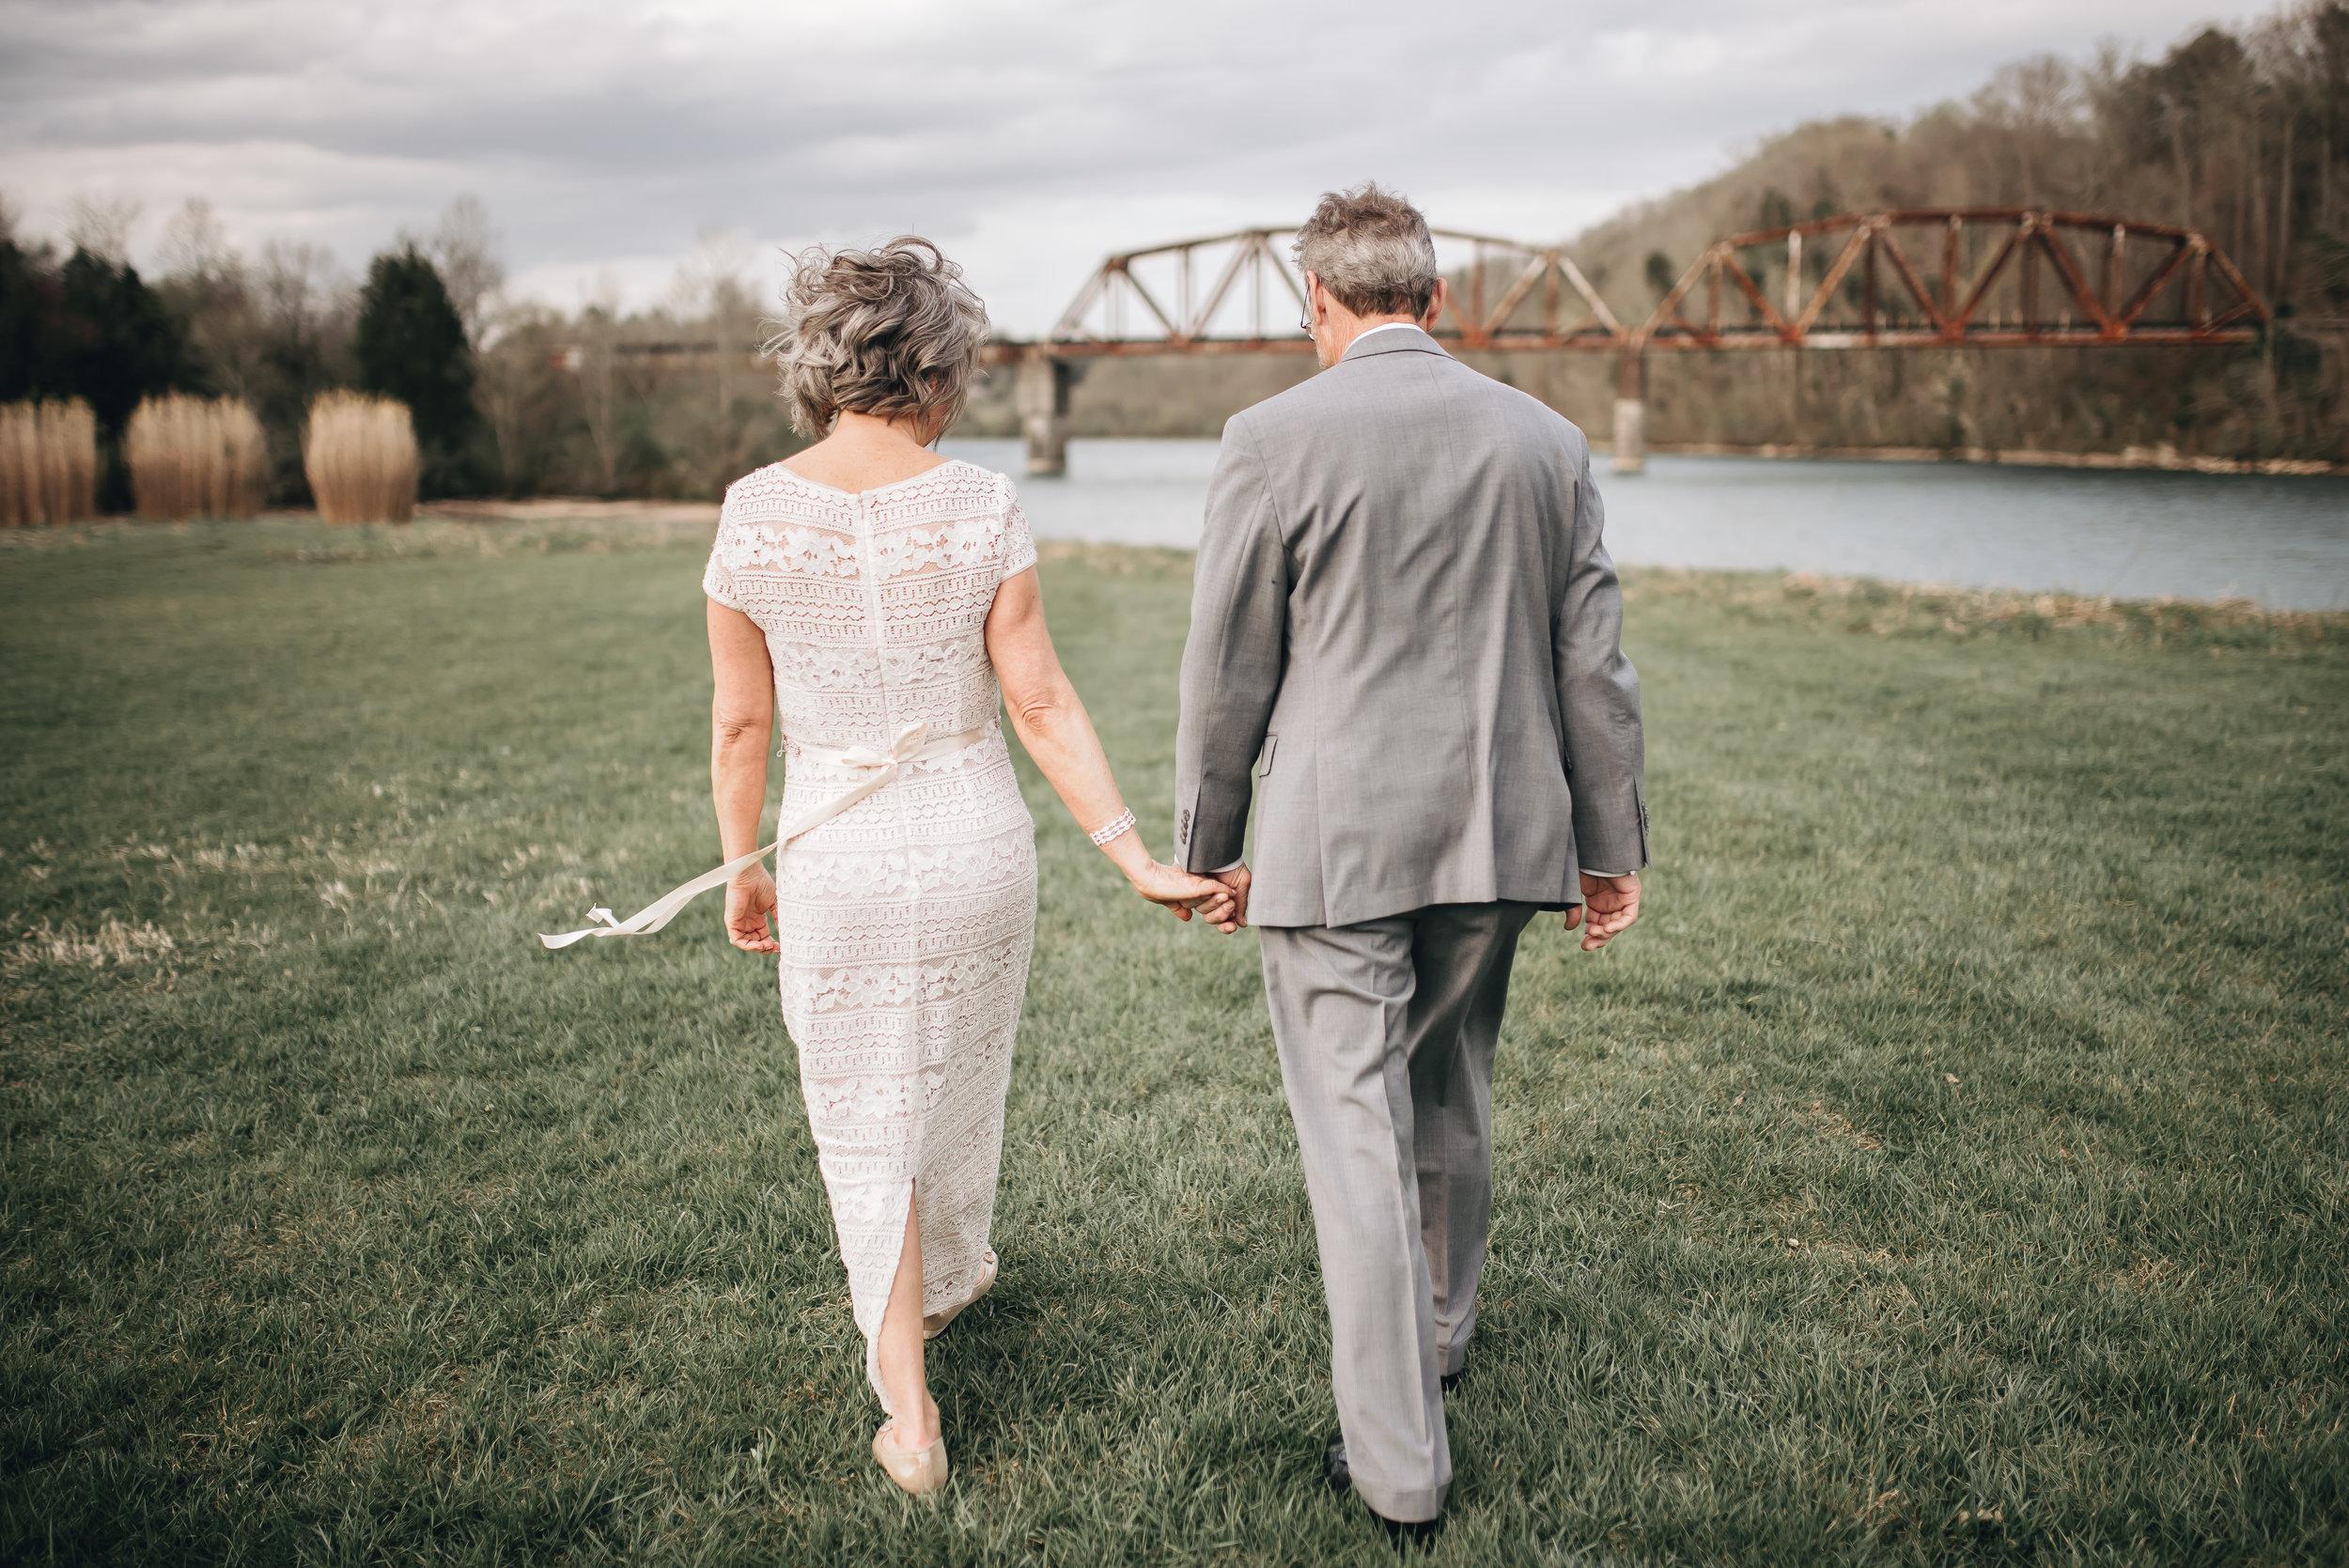 tina and bob wedding - edits-146.jpg